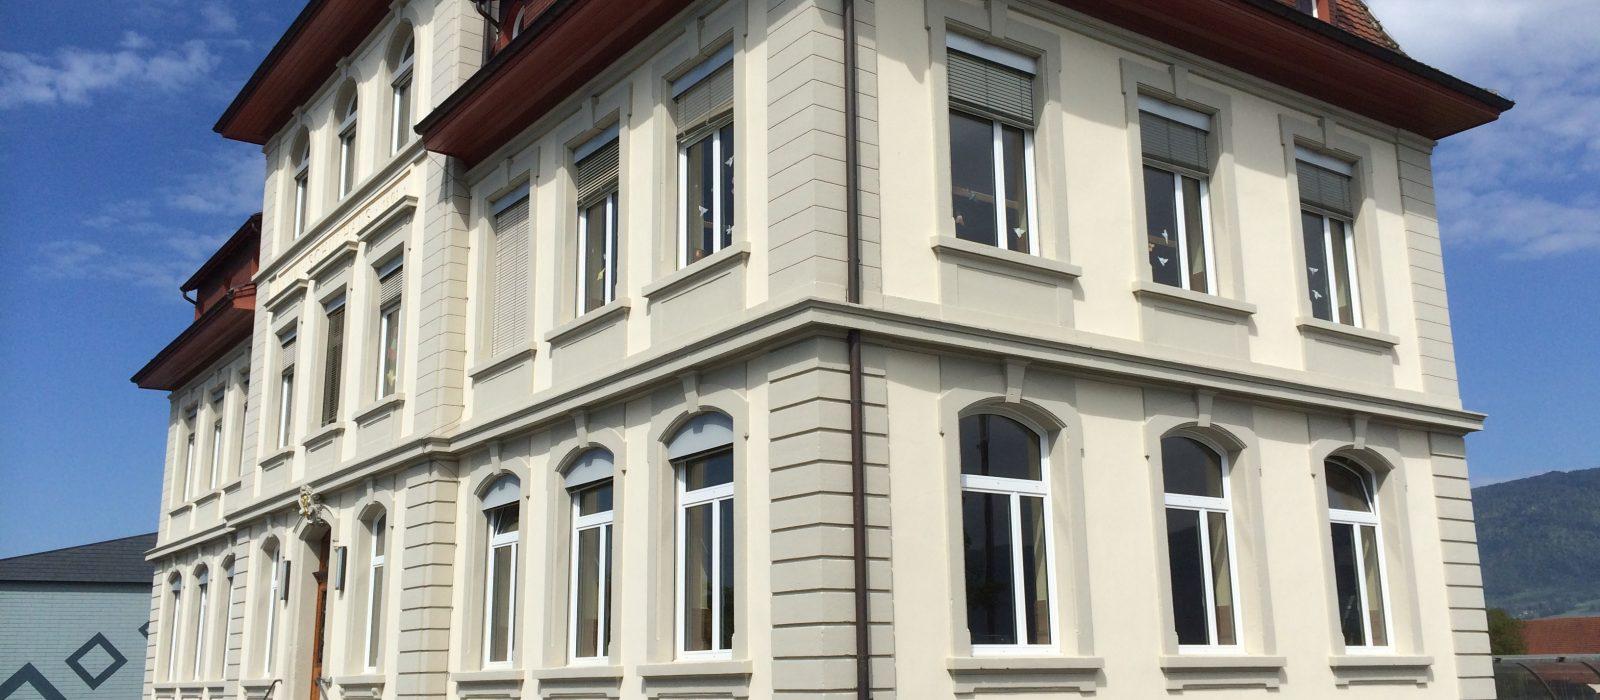 Sansoni_Historische-Bauten